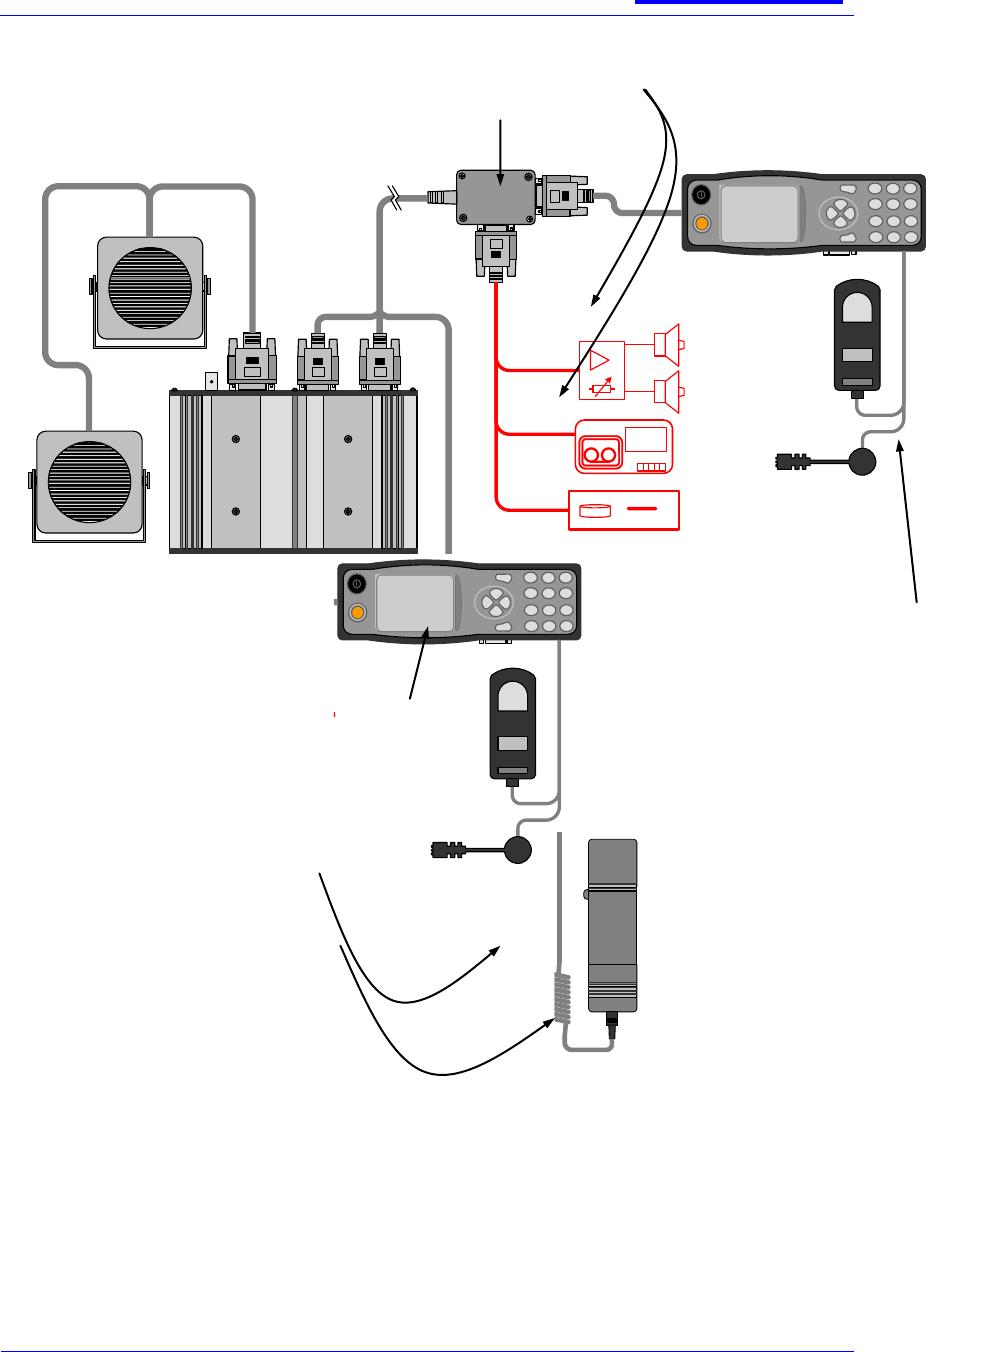 Sepura SRG3500XB TETRA Mobile/Gateway Terminal User Manual